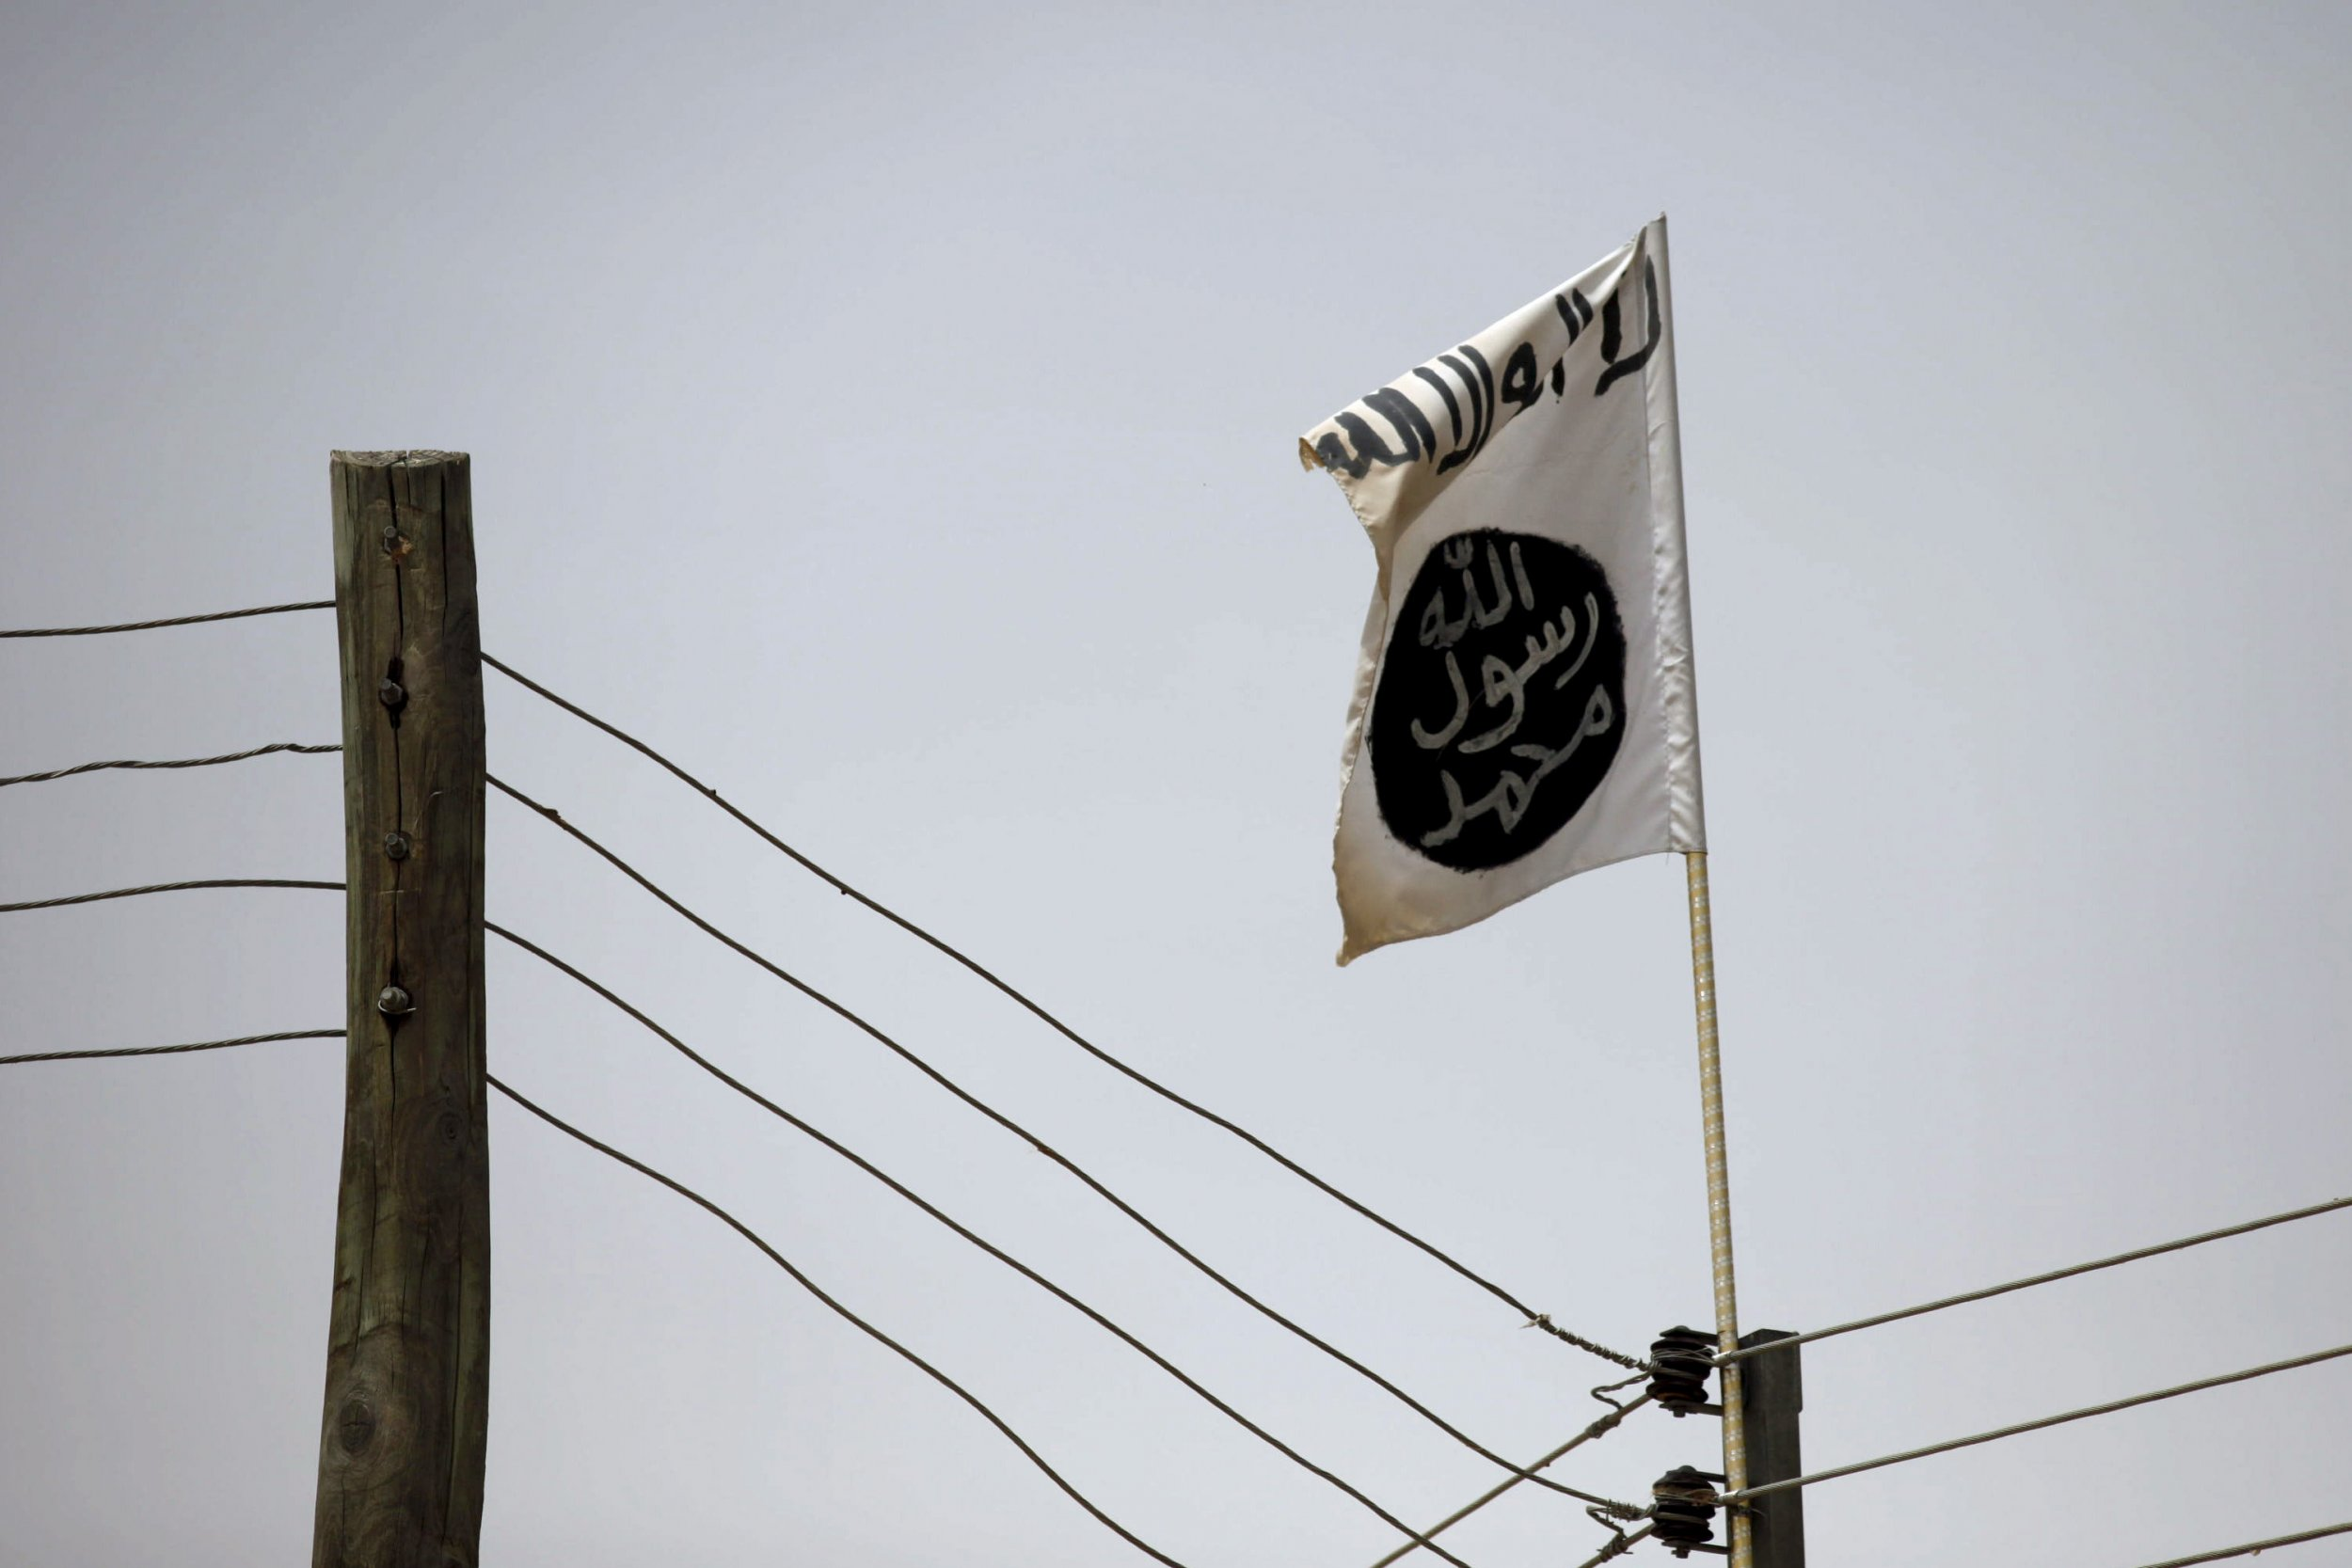 A Boko Haram flag flies in Damasak, Nigeria.